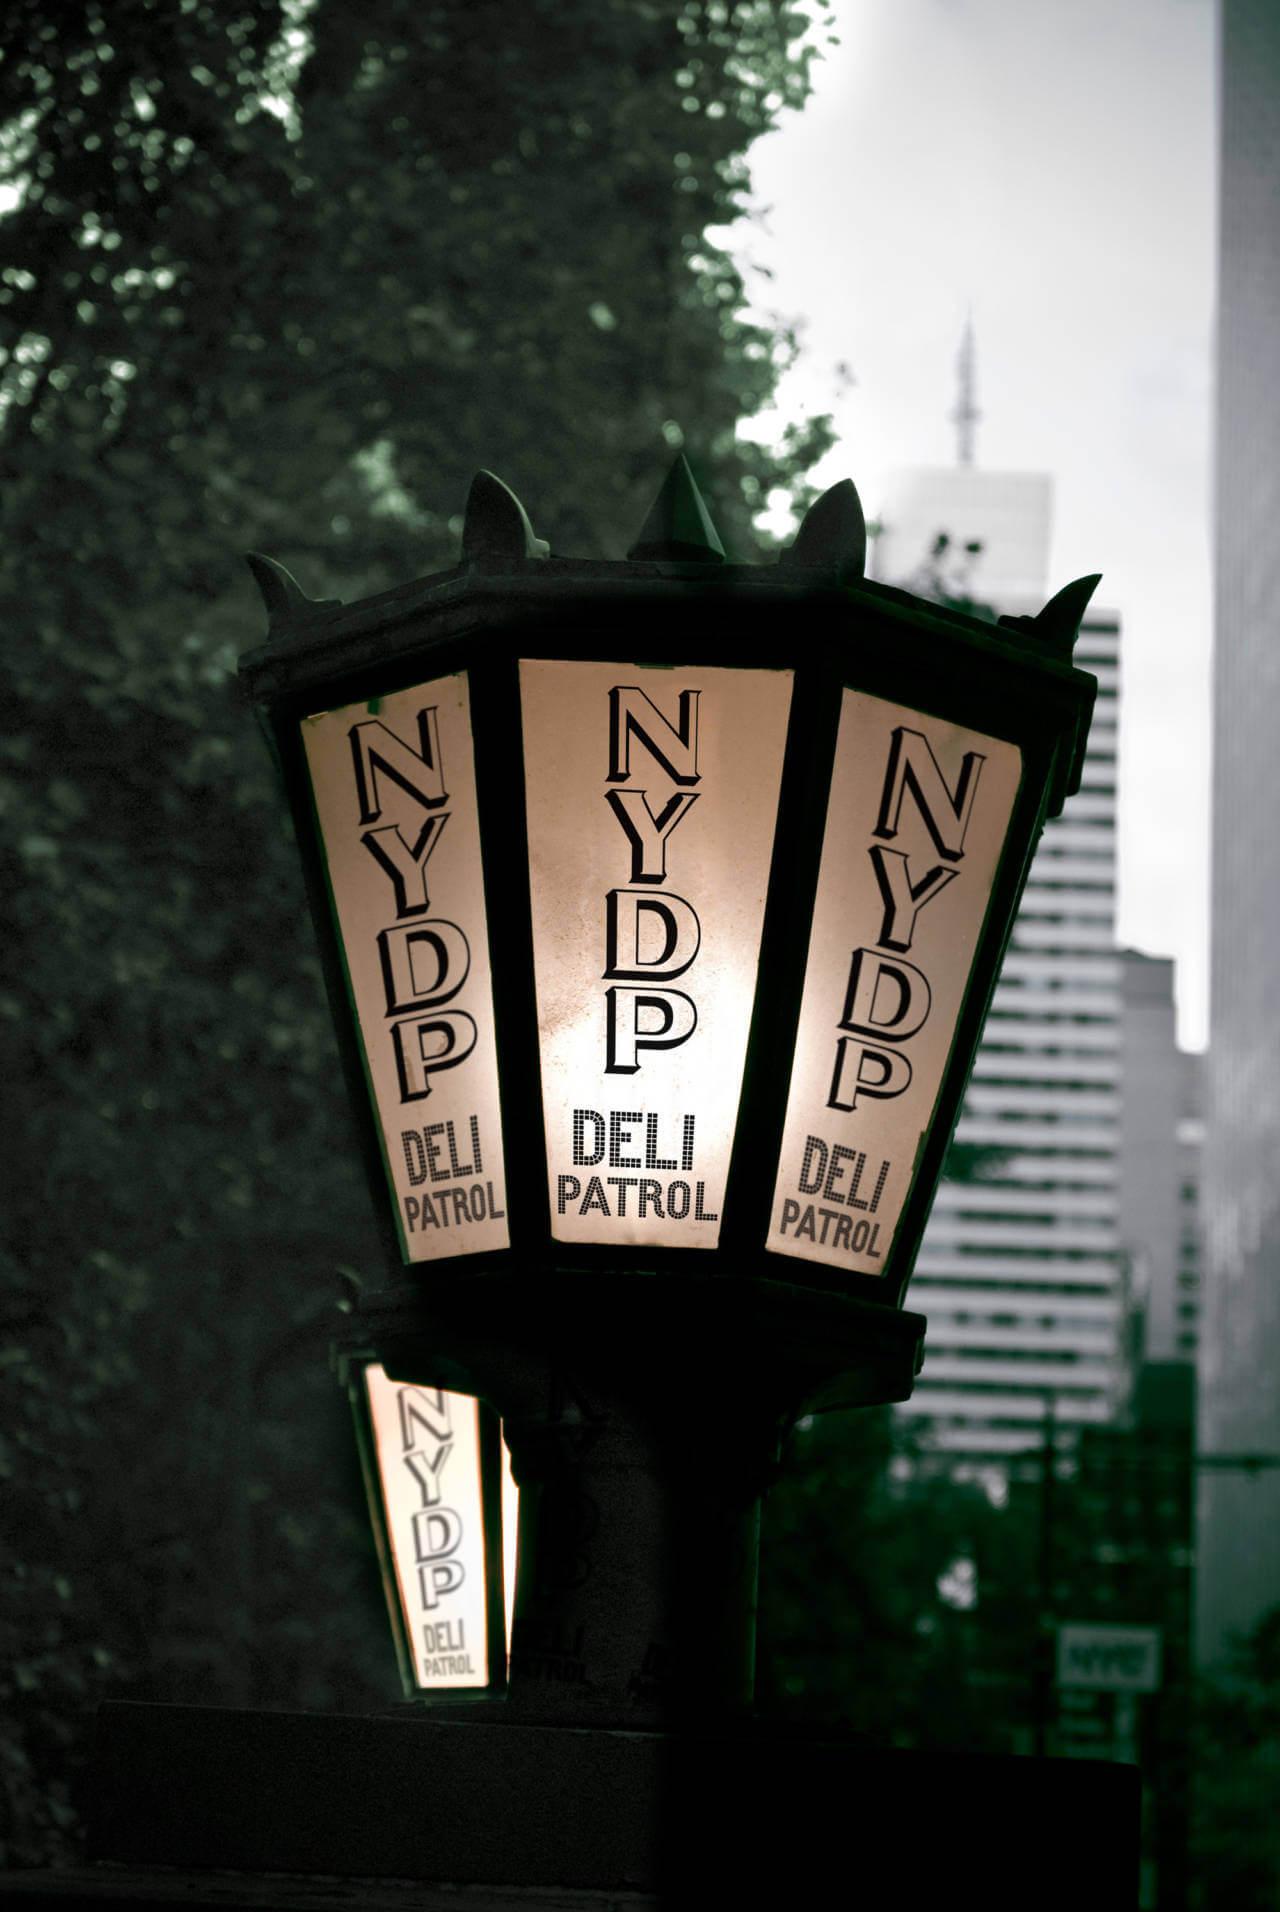 New York City Brand identity by David Brier